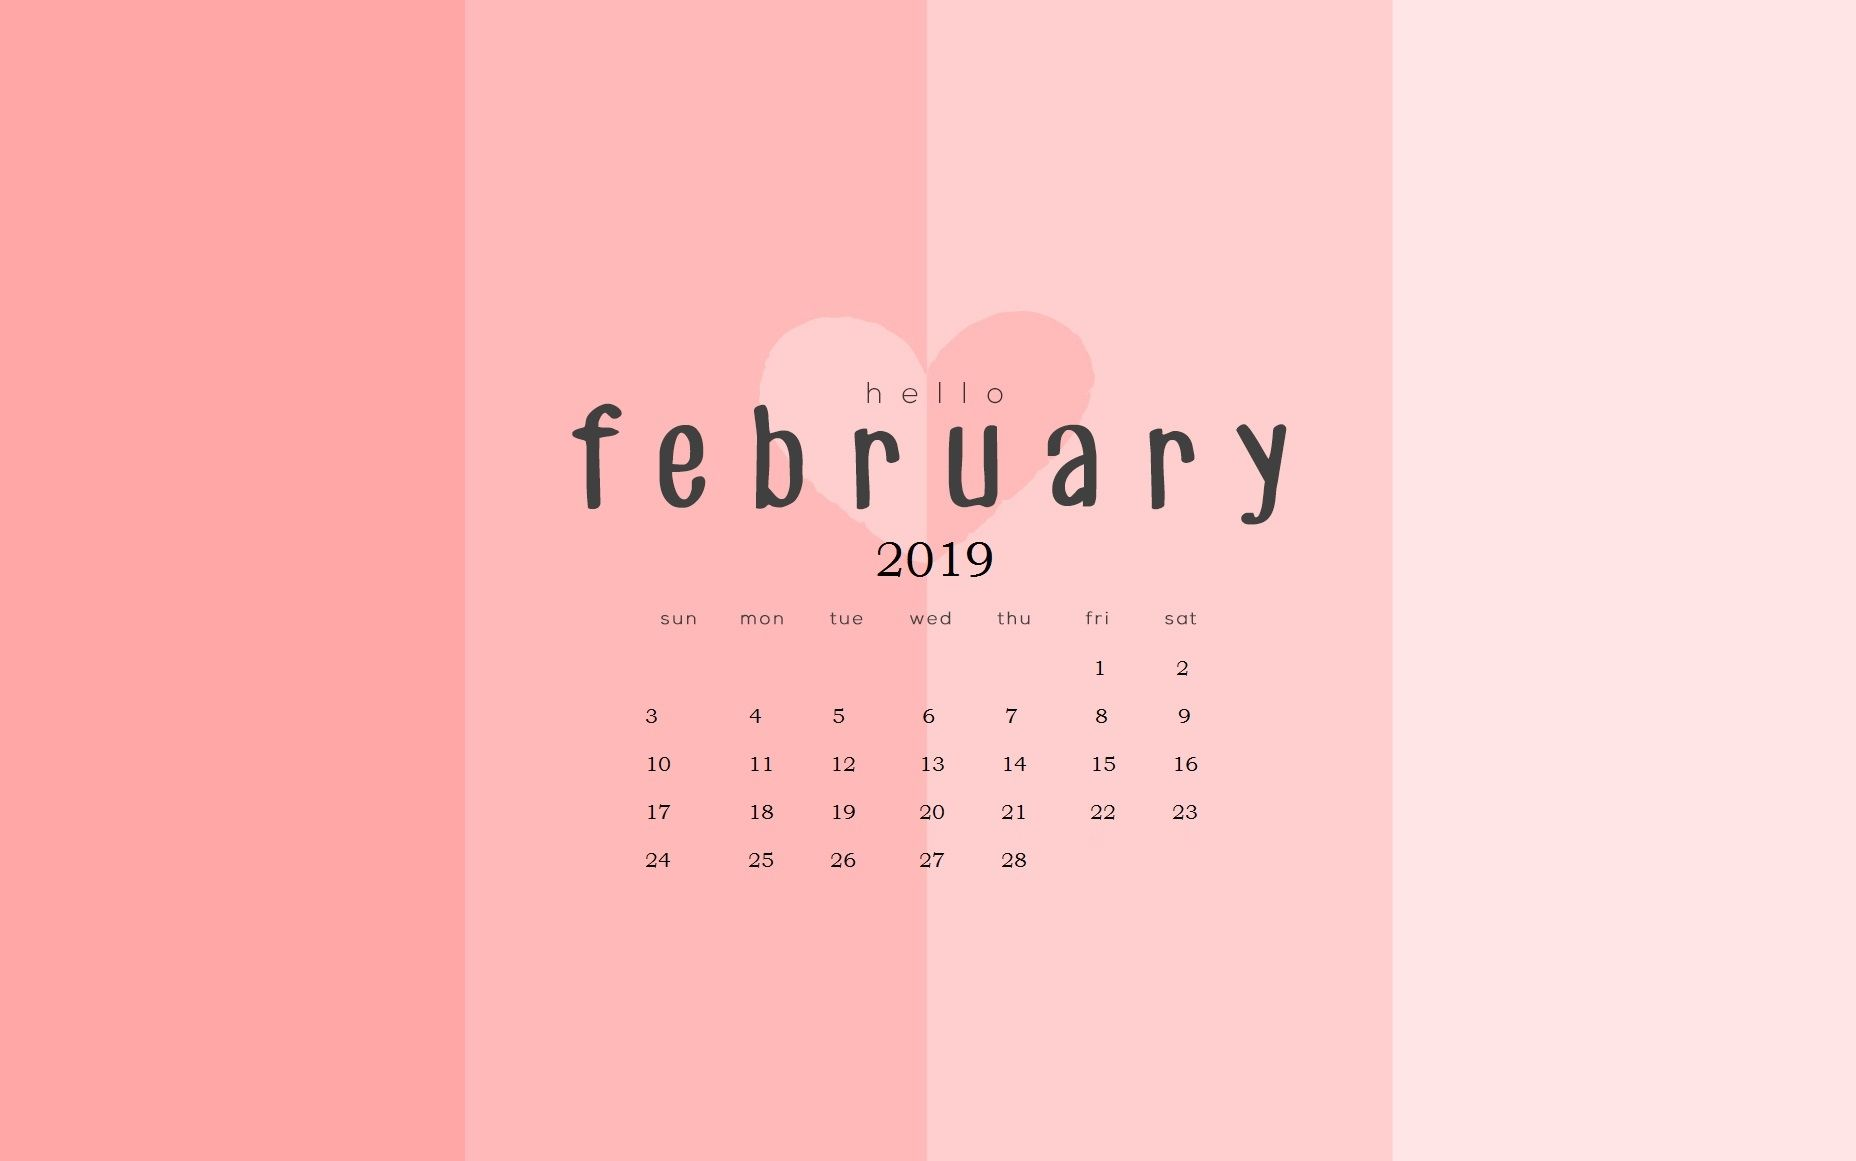 february 2019 calendar wallpapers calendar 2019february ...